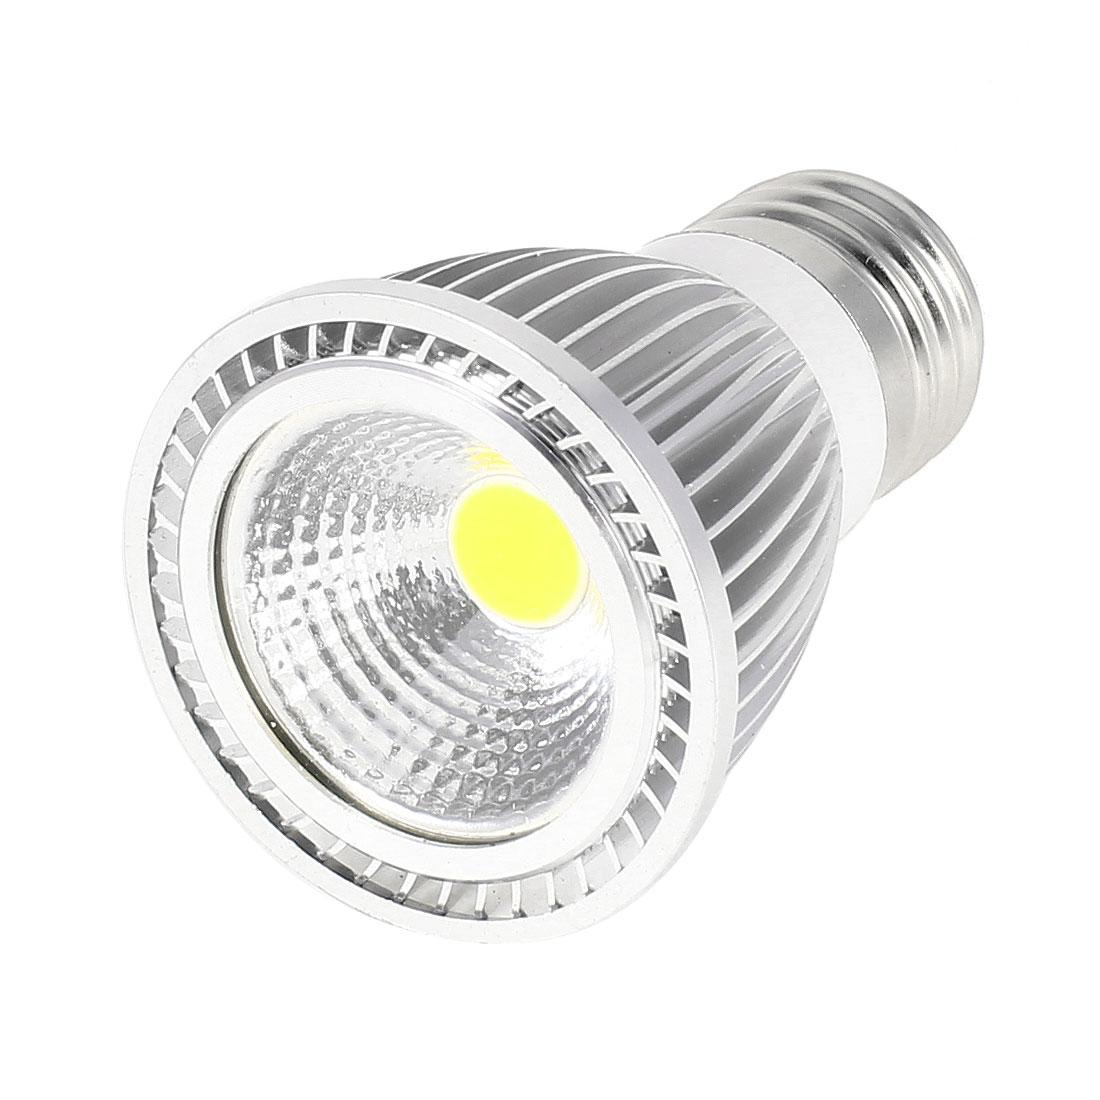 AC 85-265V E27 Socket 5W COB Warm White LED Light Ceiling Spotlight Lamp Bulb